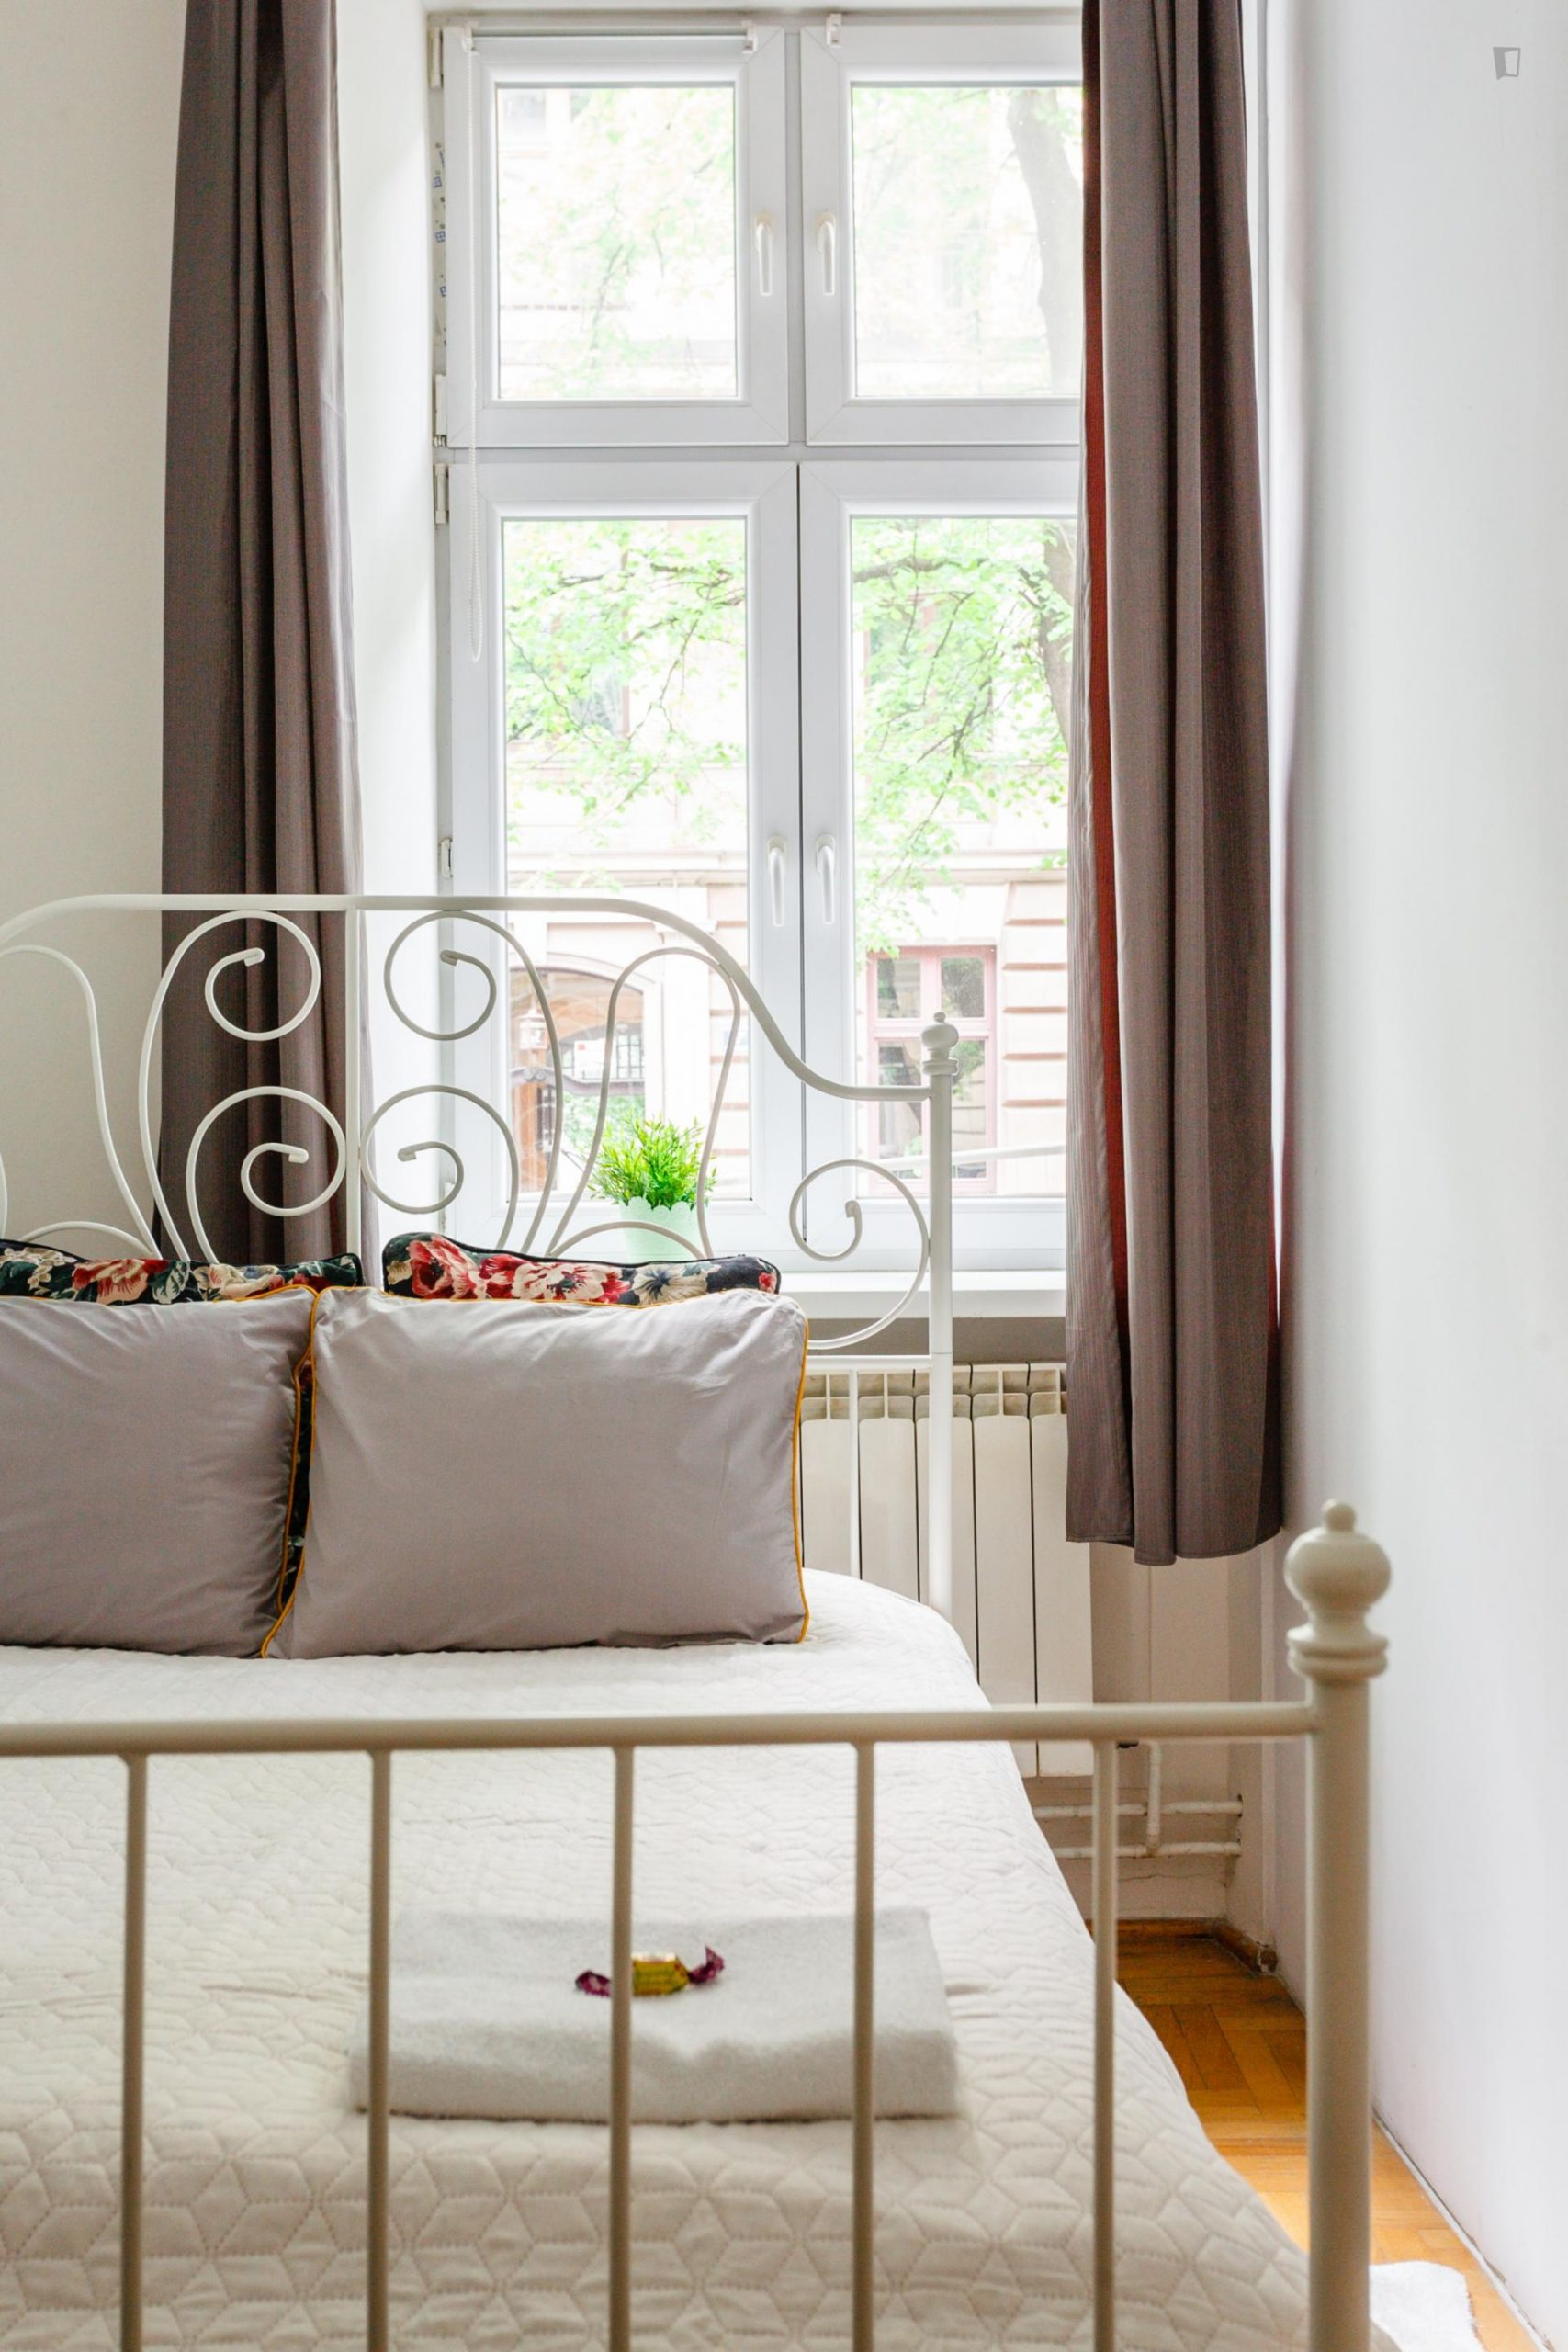 Bogus - Entry ready bedroom in Krakow